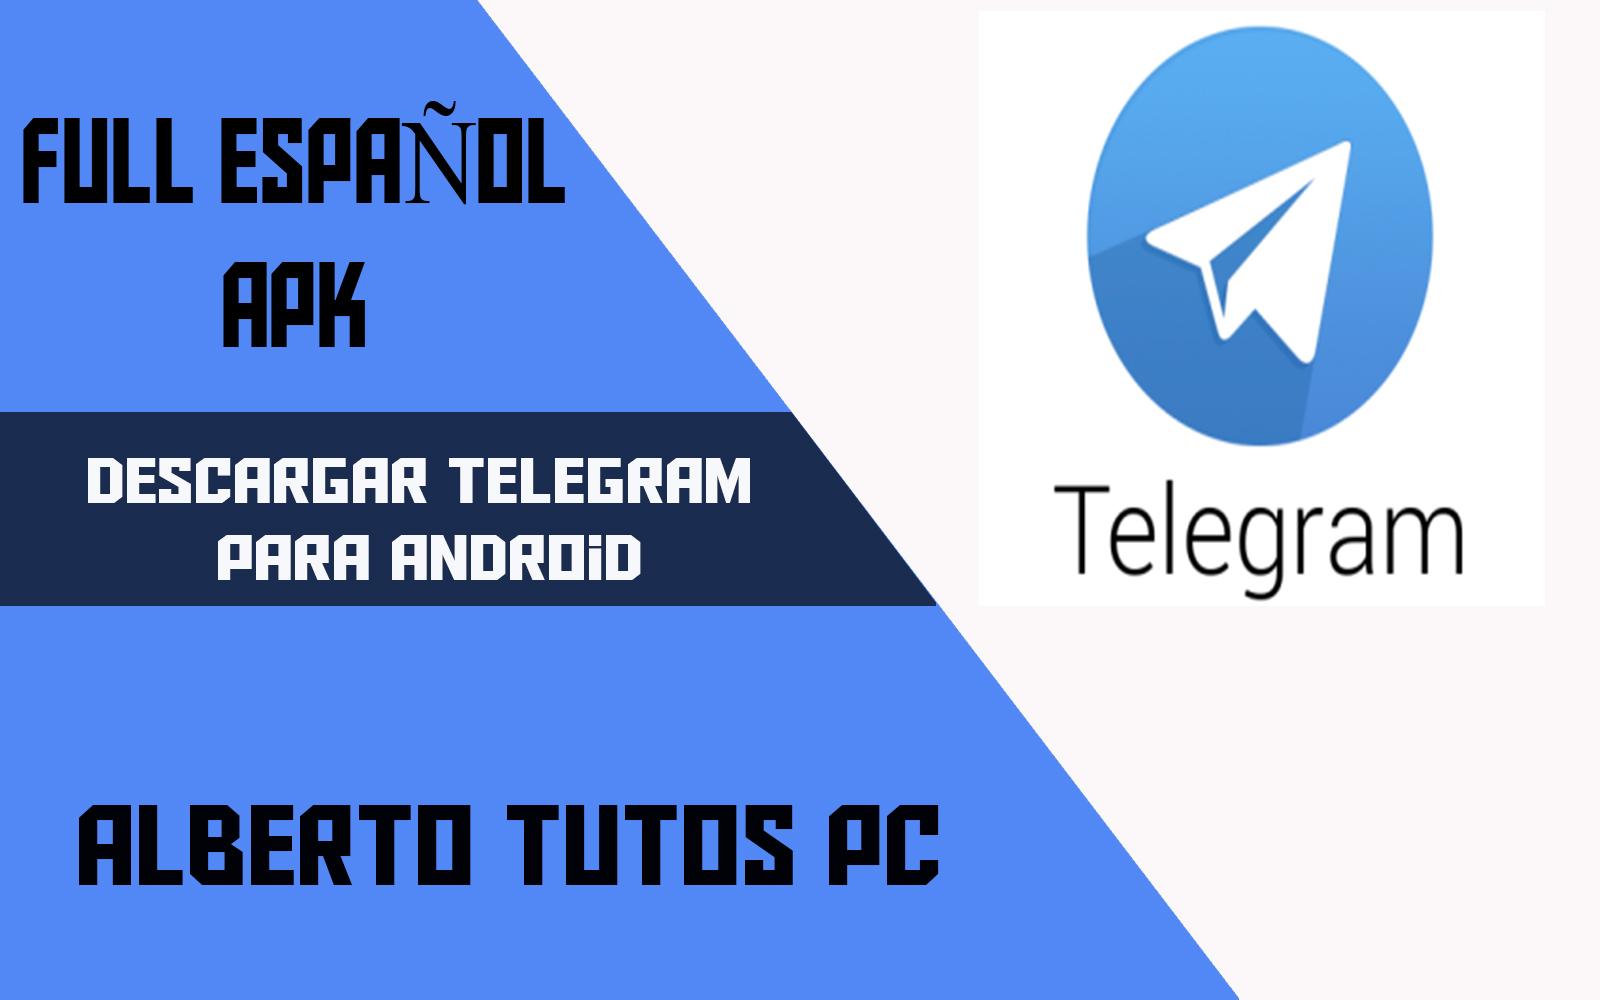 DESCARGAR TELEGRAM : AlbertoTutosPC